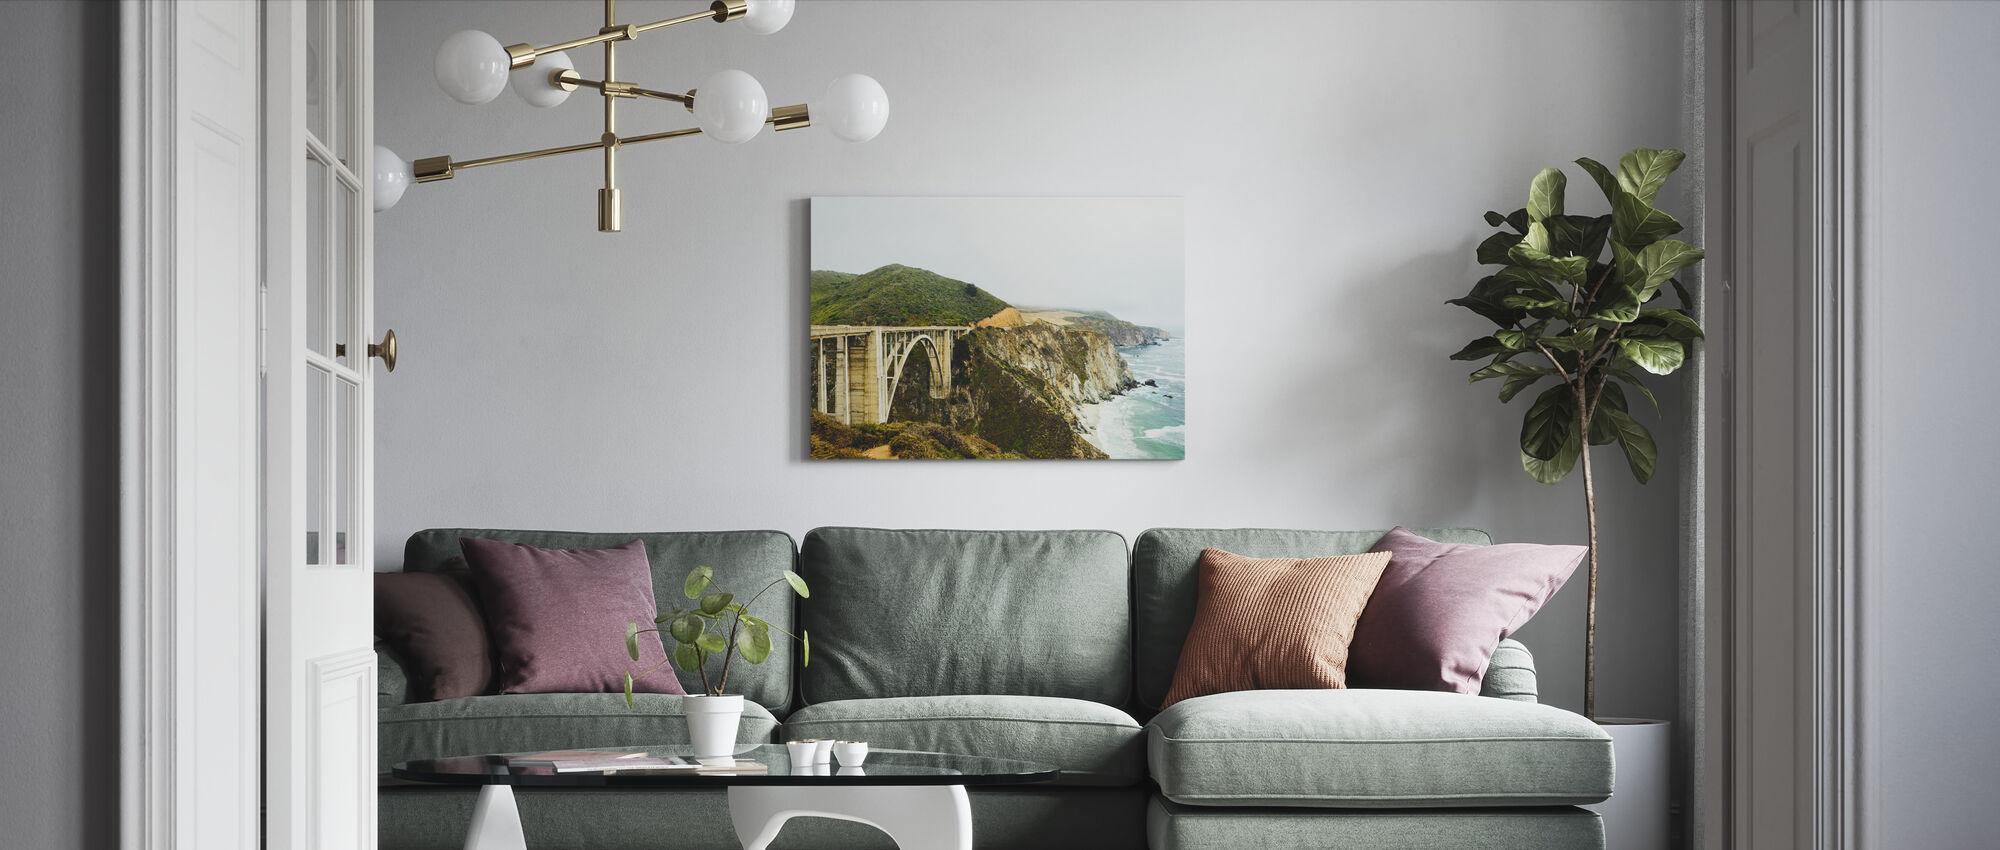 Bixby Creek Bridge, Big Sur California - Canvas print - Living Room